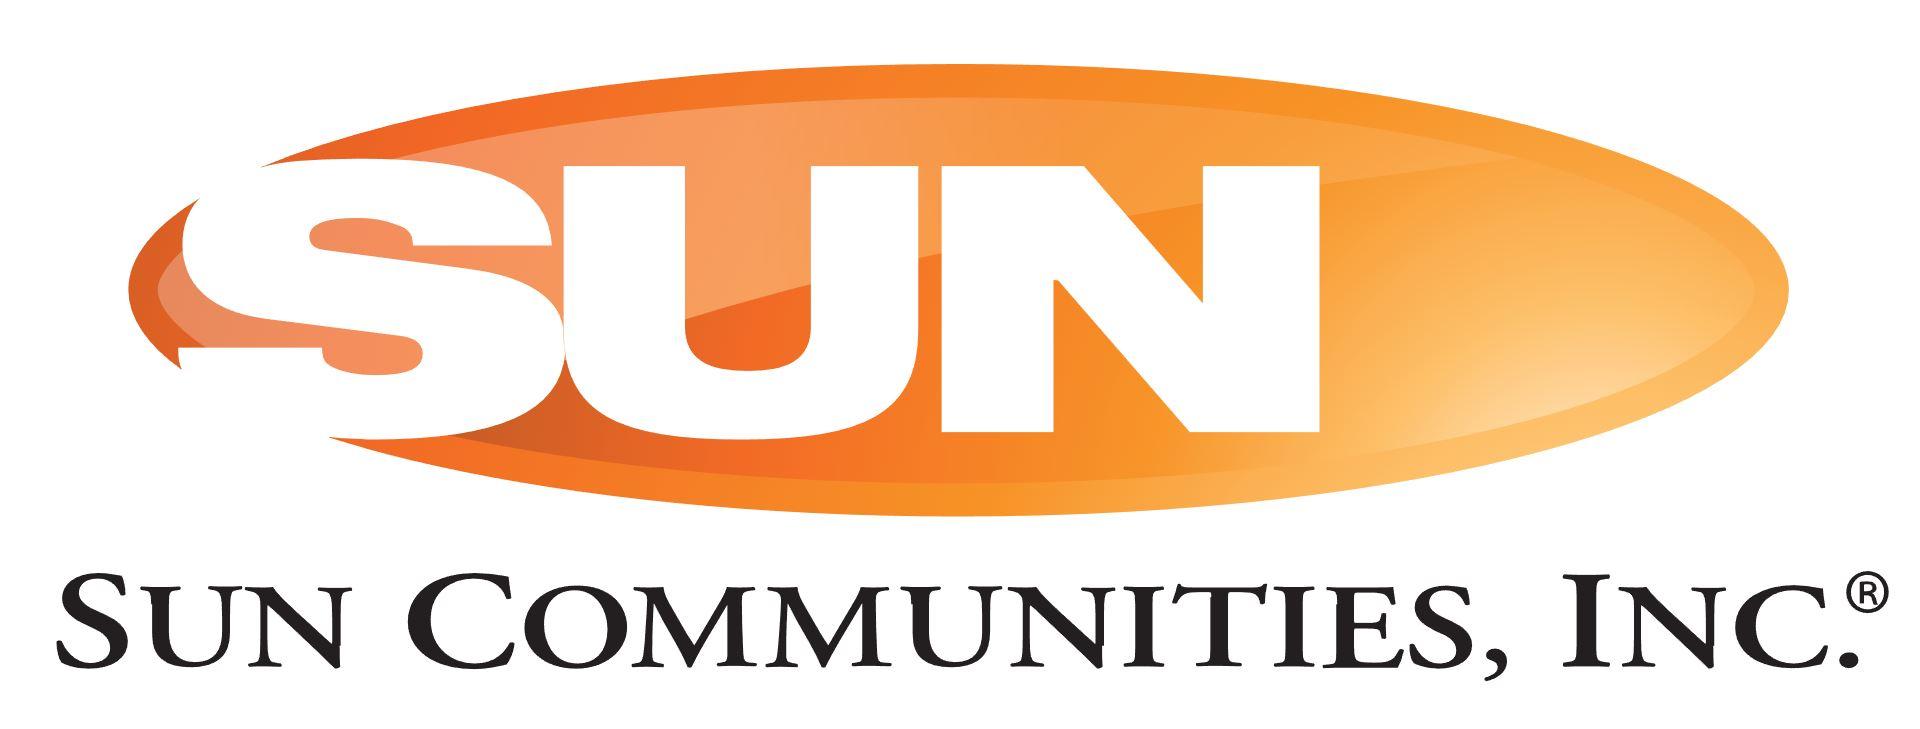 Sun Communities, Inc. Logo